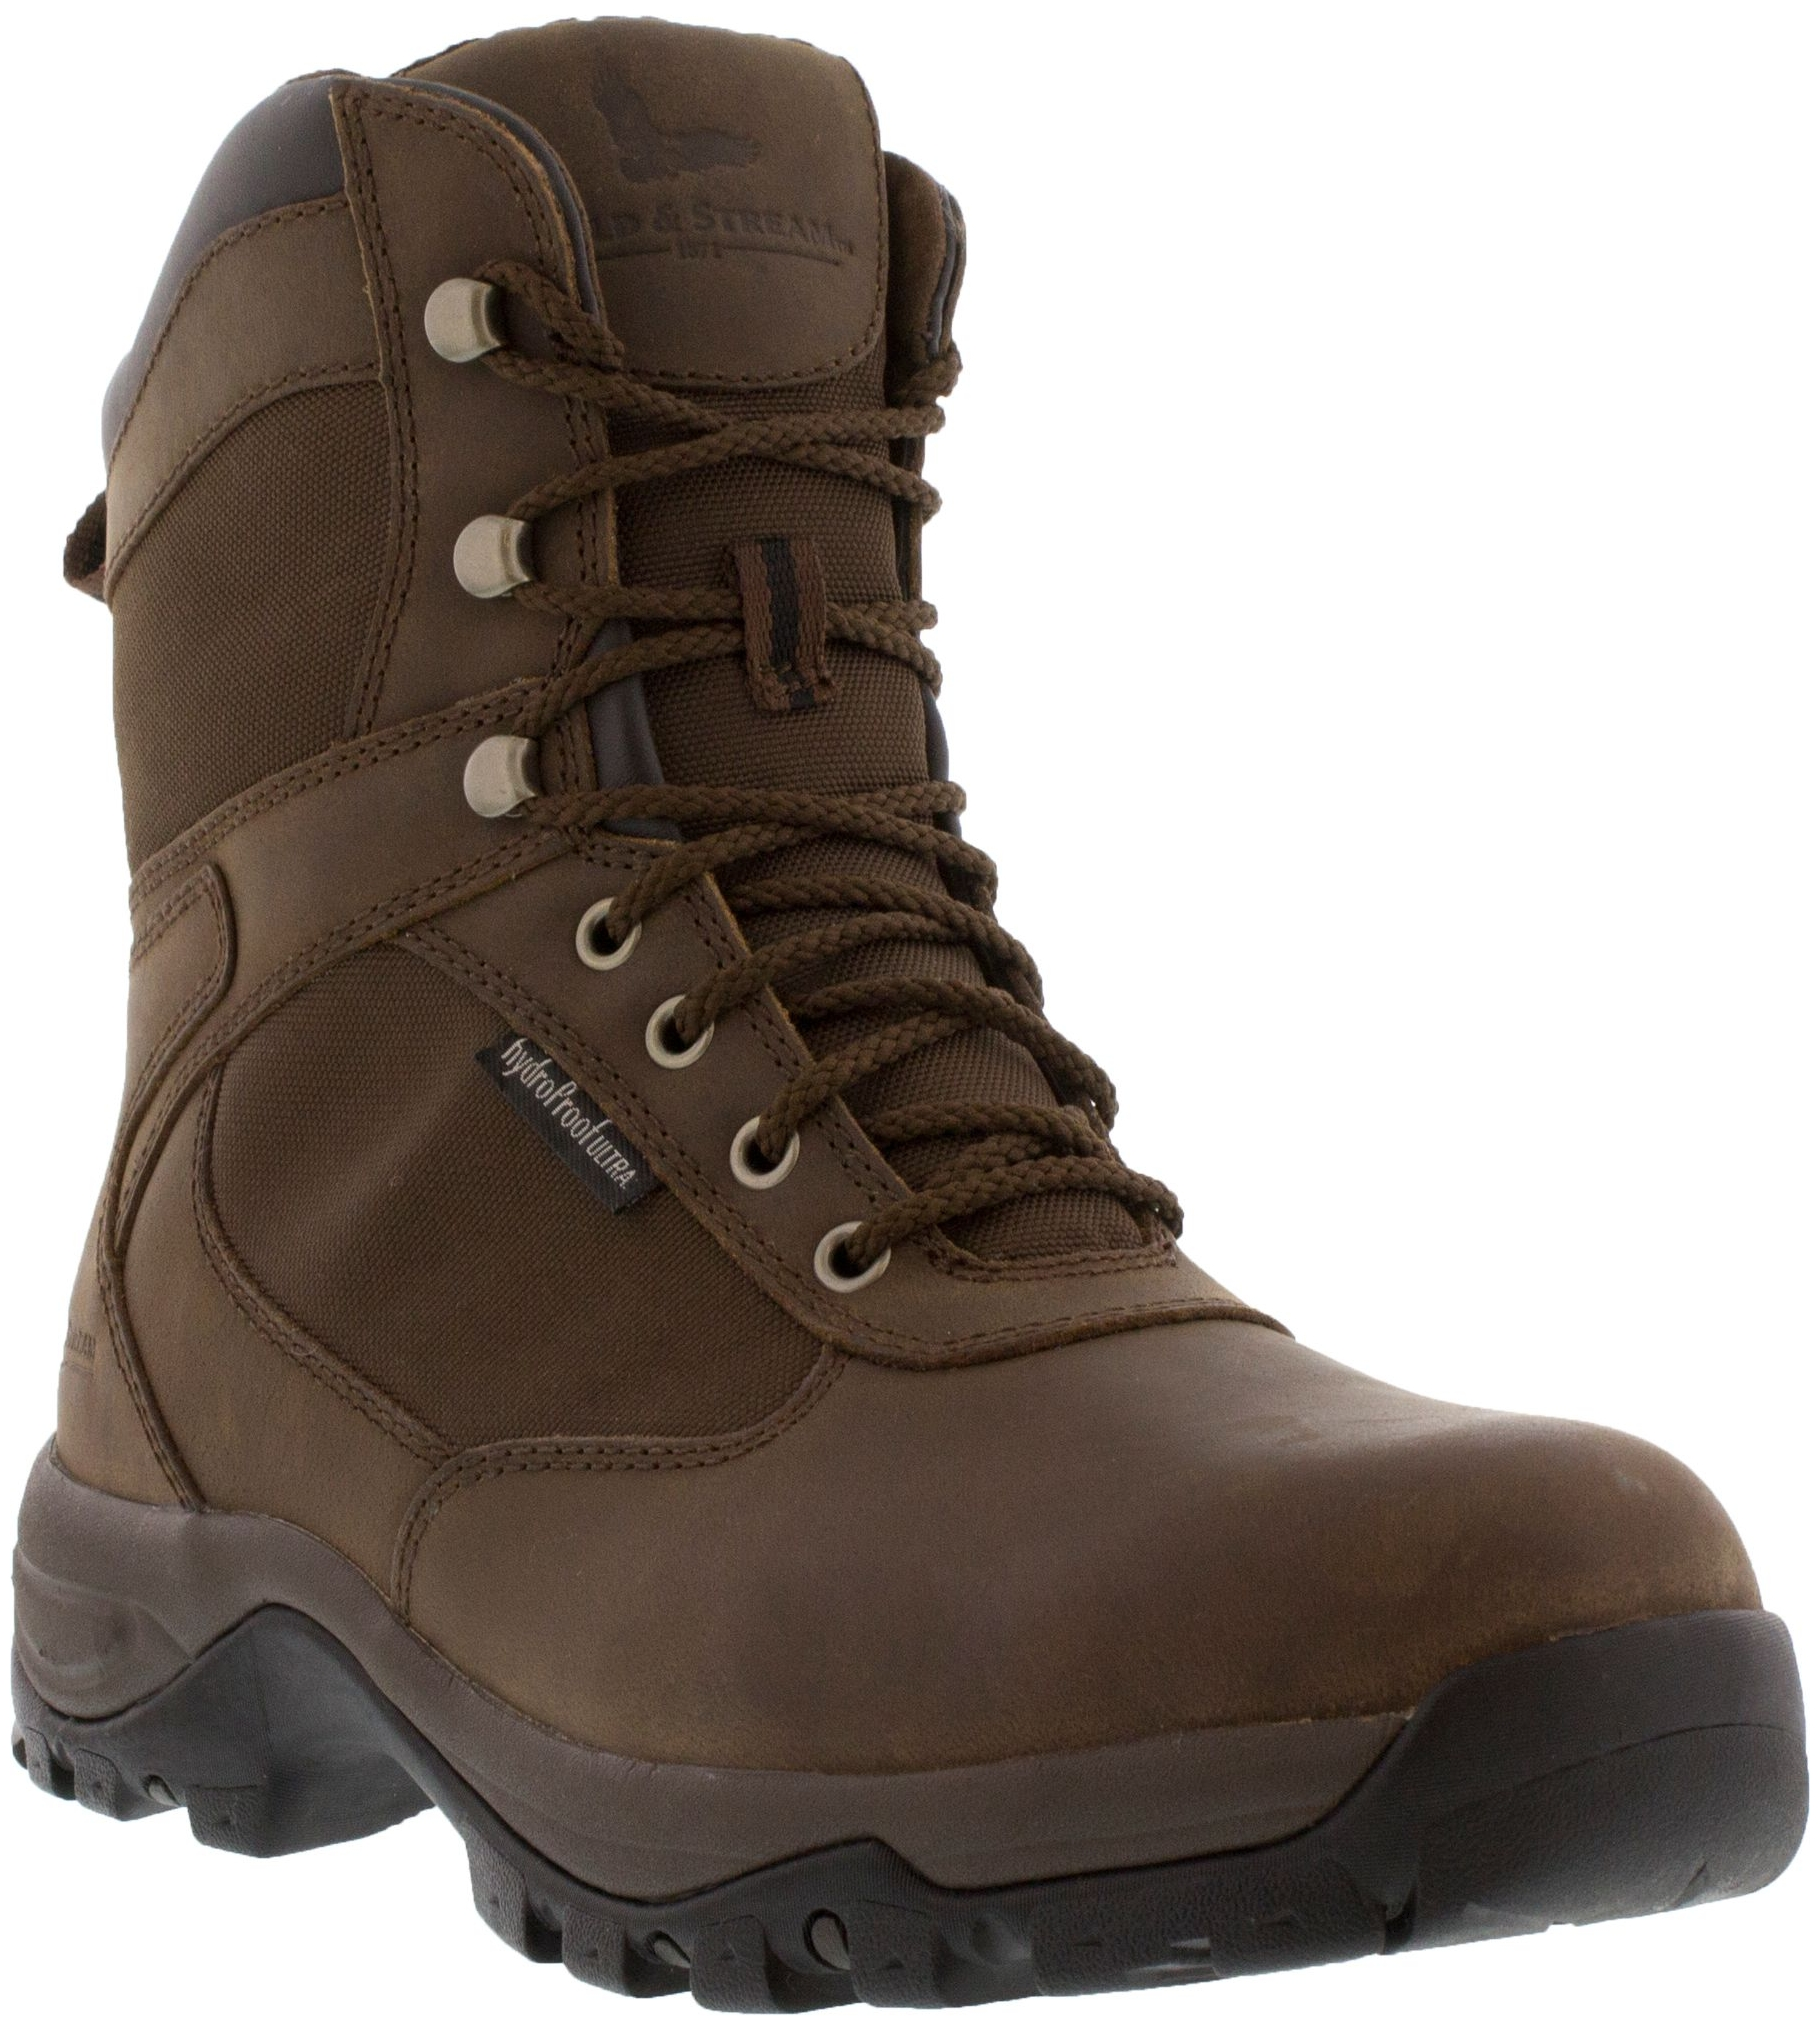 Field & Stream Men's Woodsman 800g Hunting Boots (Brown, ...